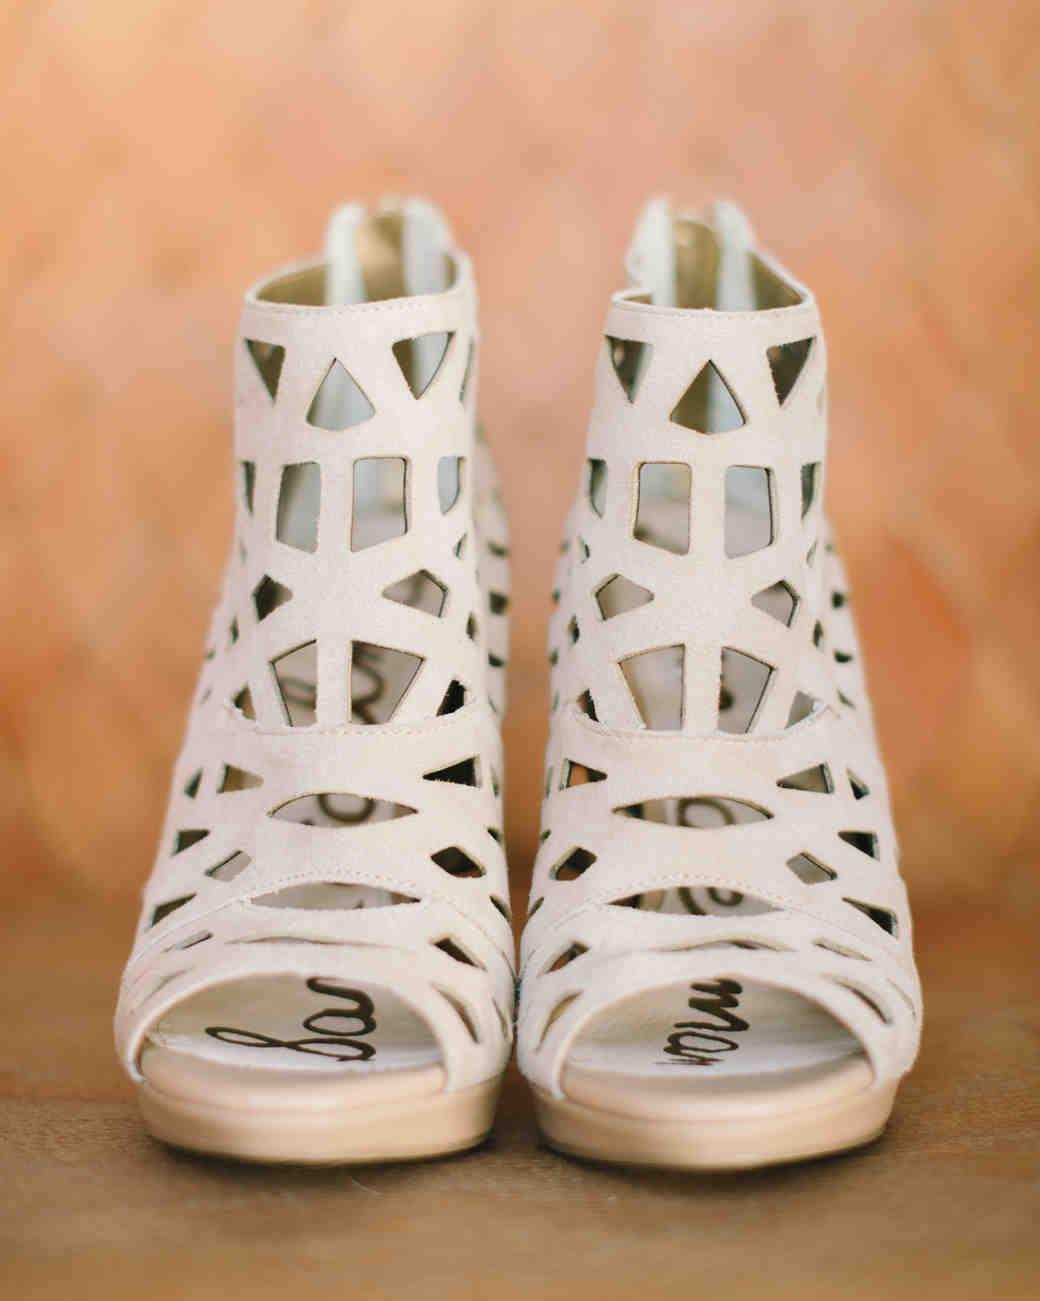 carlie-gabe-bride-shoes-031dm1-4779-s111570-0515.jpg